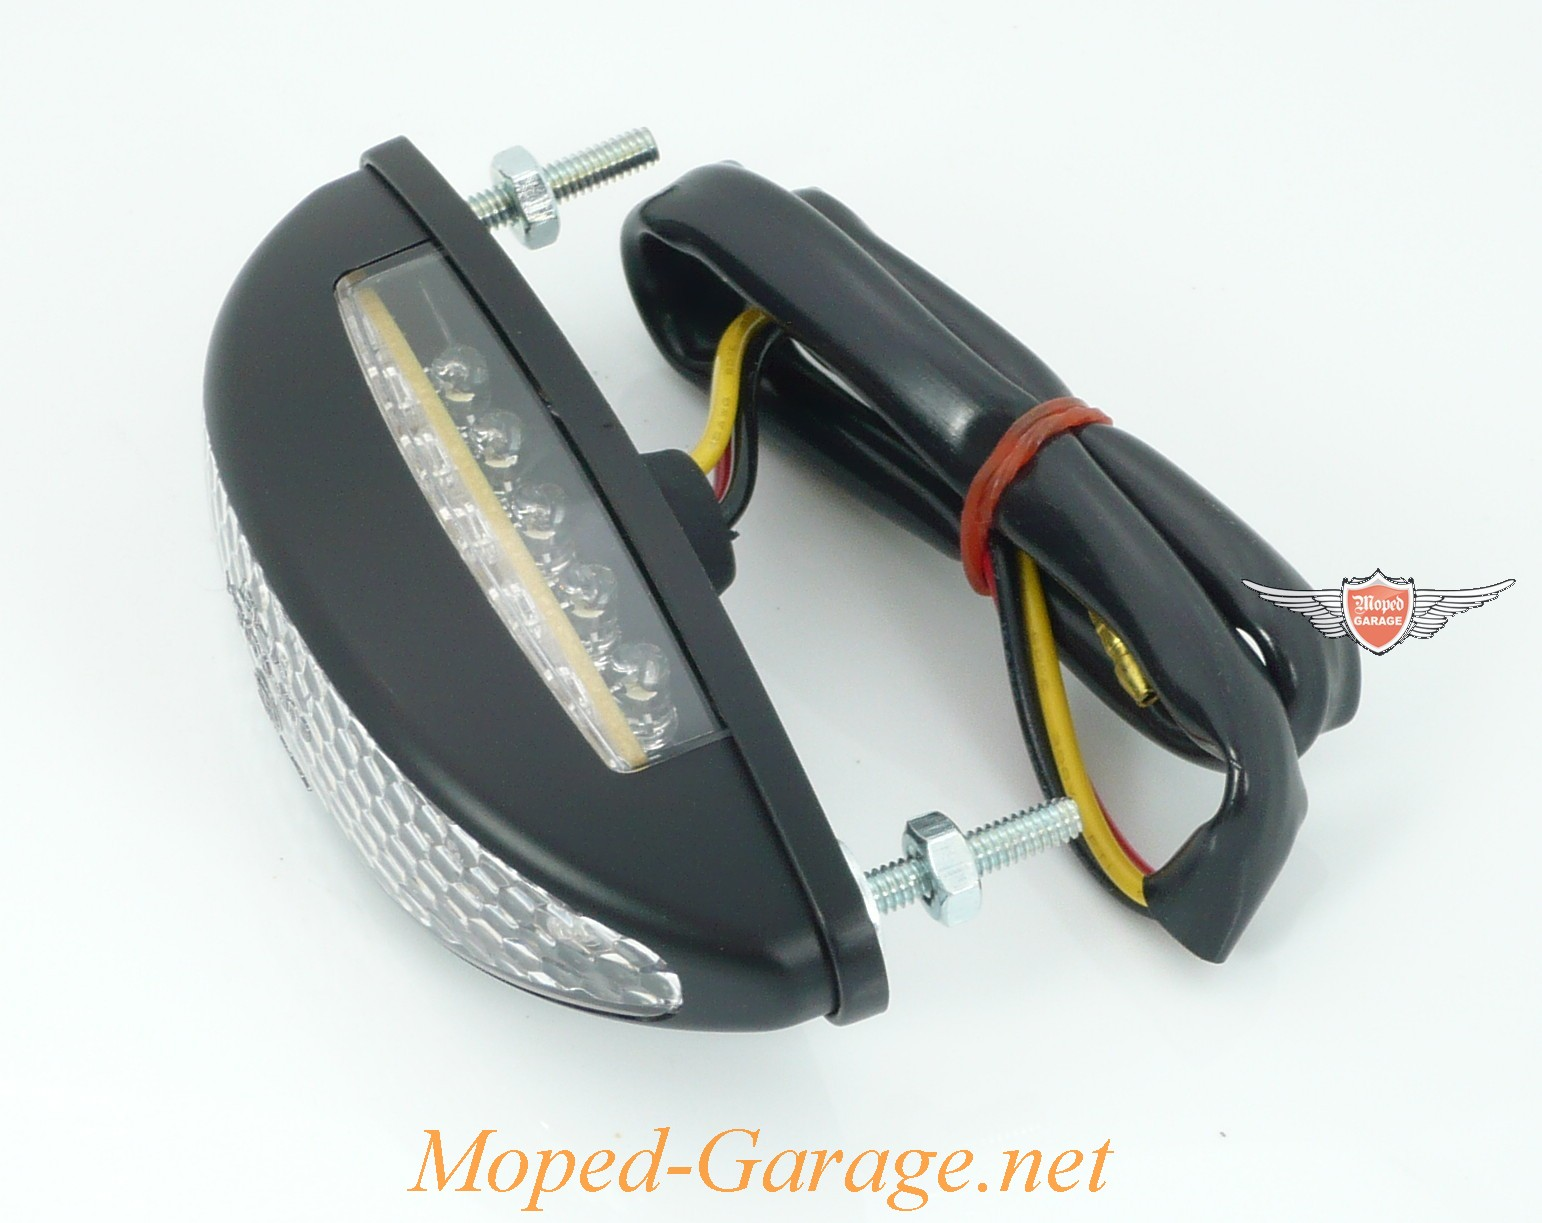 moped harley motorrad led black light micro. Black Bedroom Furniture Sets. Home Design Ideas